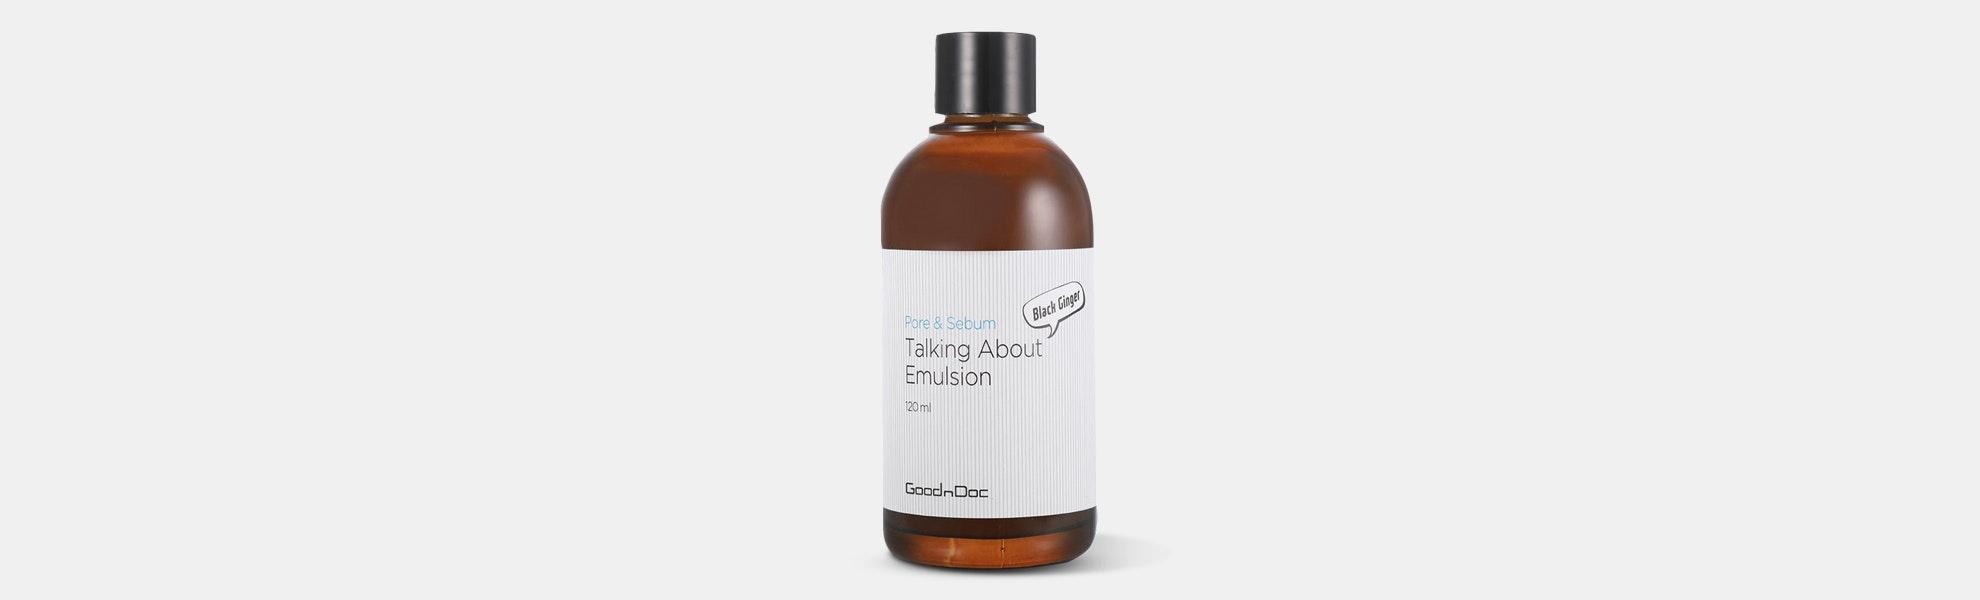 The Greenery Lab GoodnDoc Black Ginger Emulsion